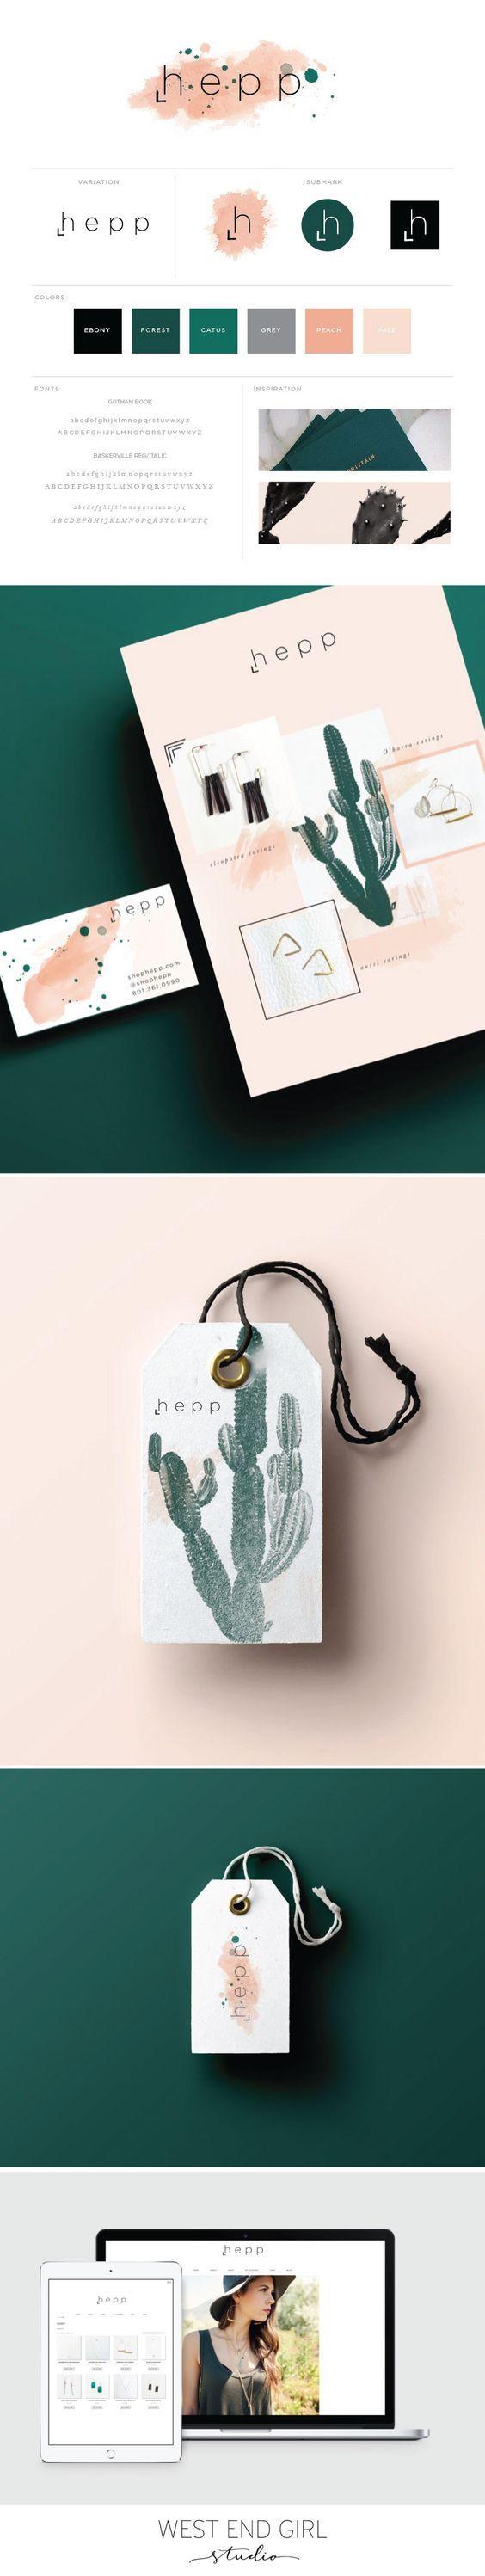 boho branding, cactus branding, bohemian design, graphic design, logo design, branding: